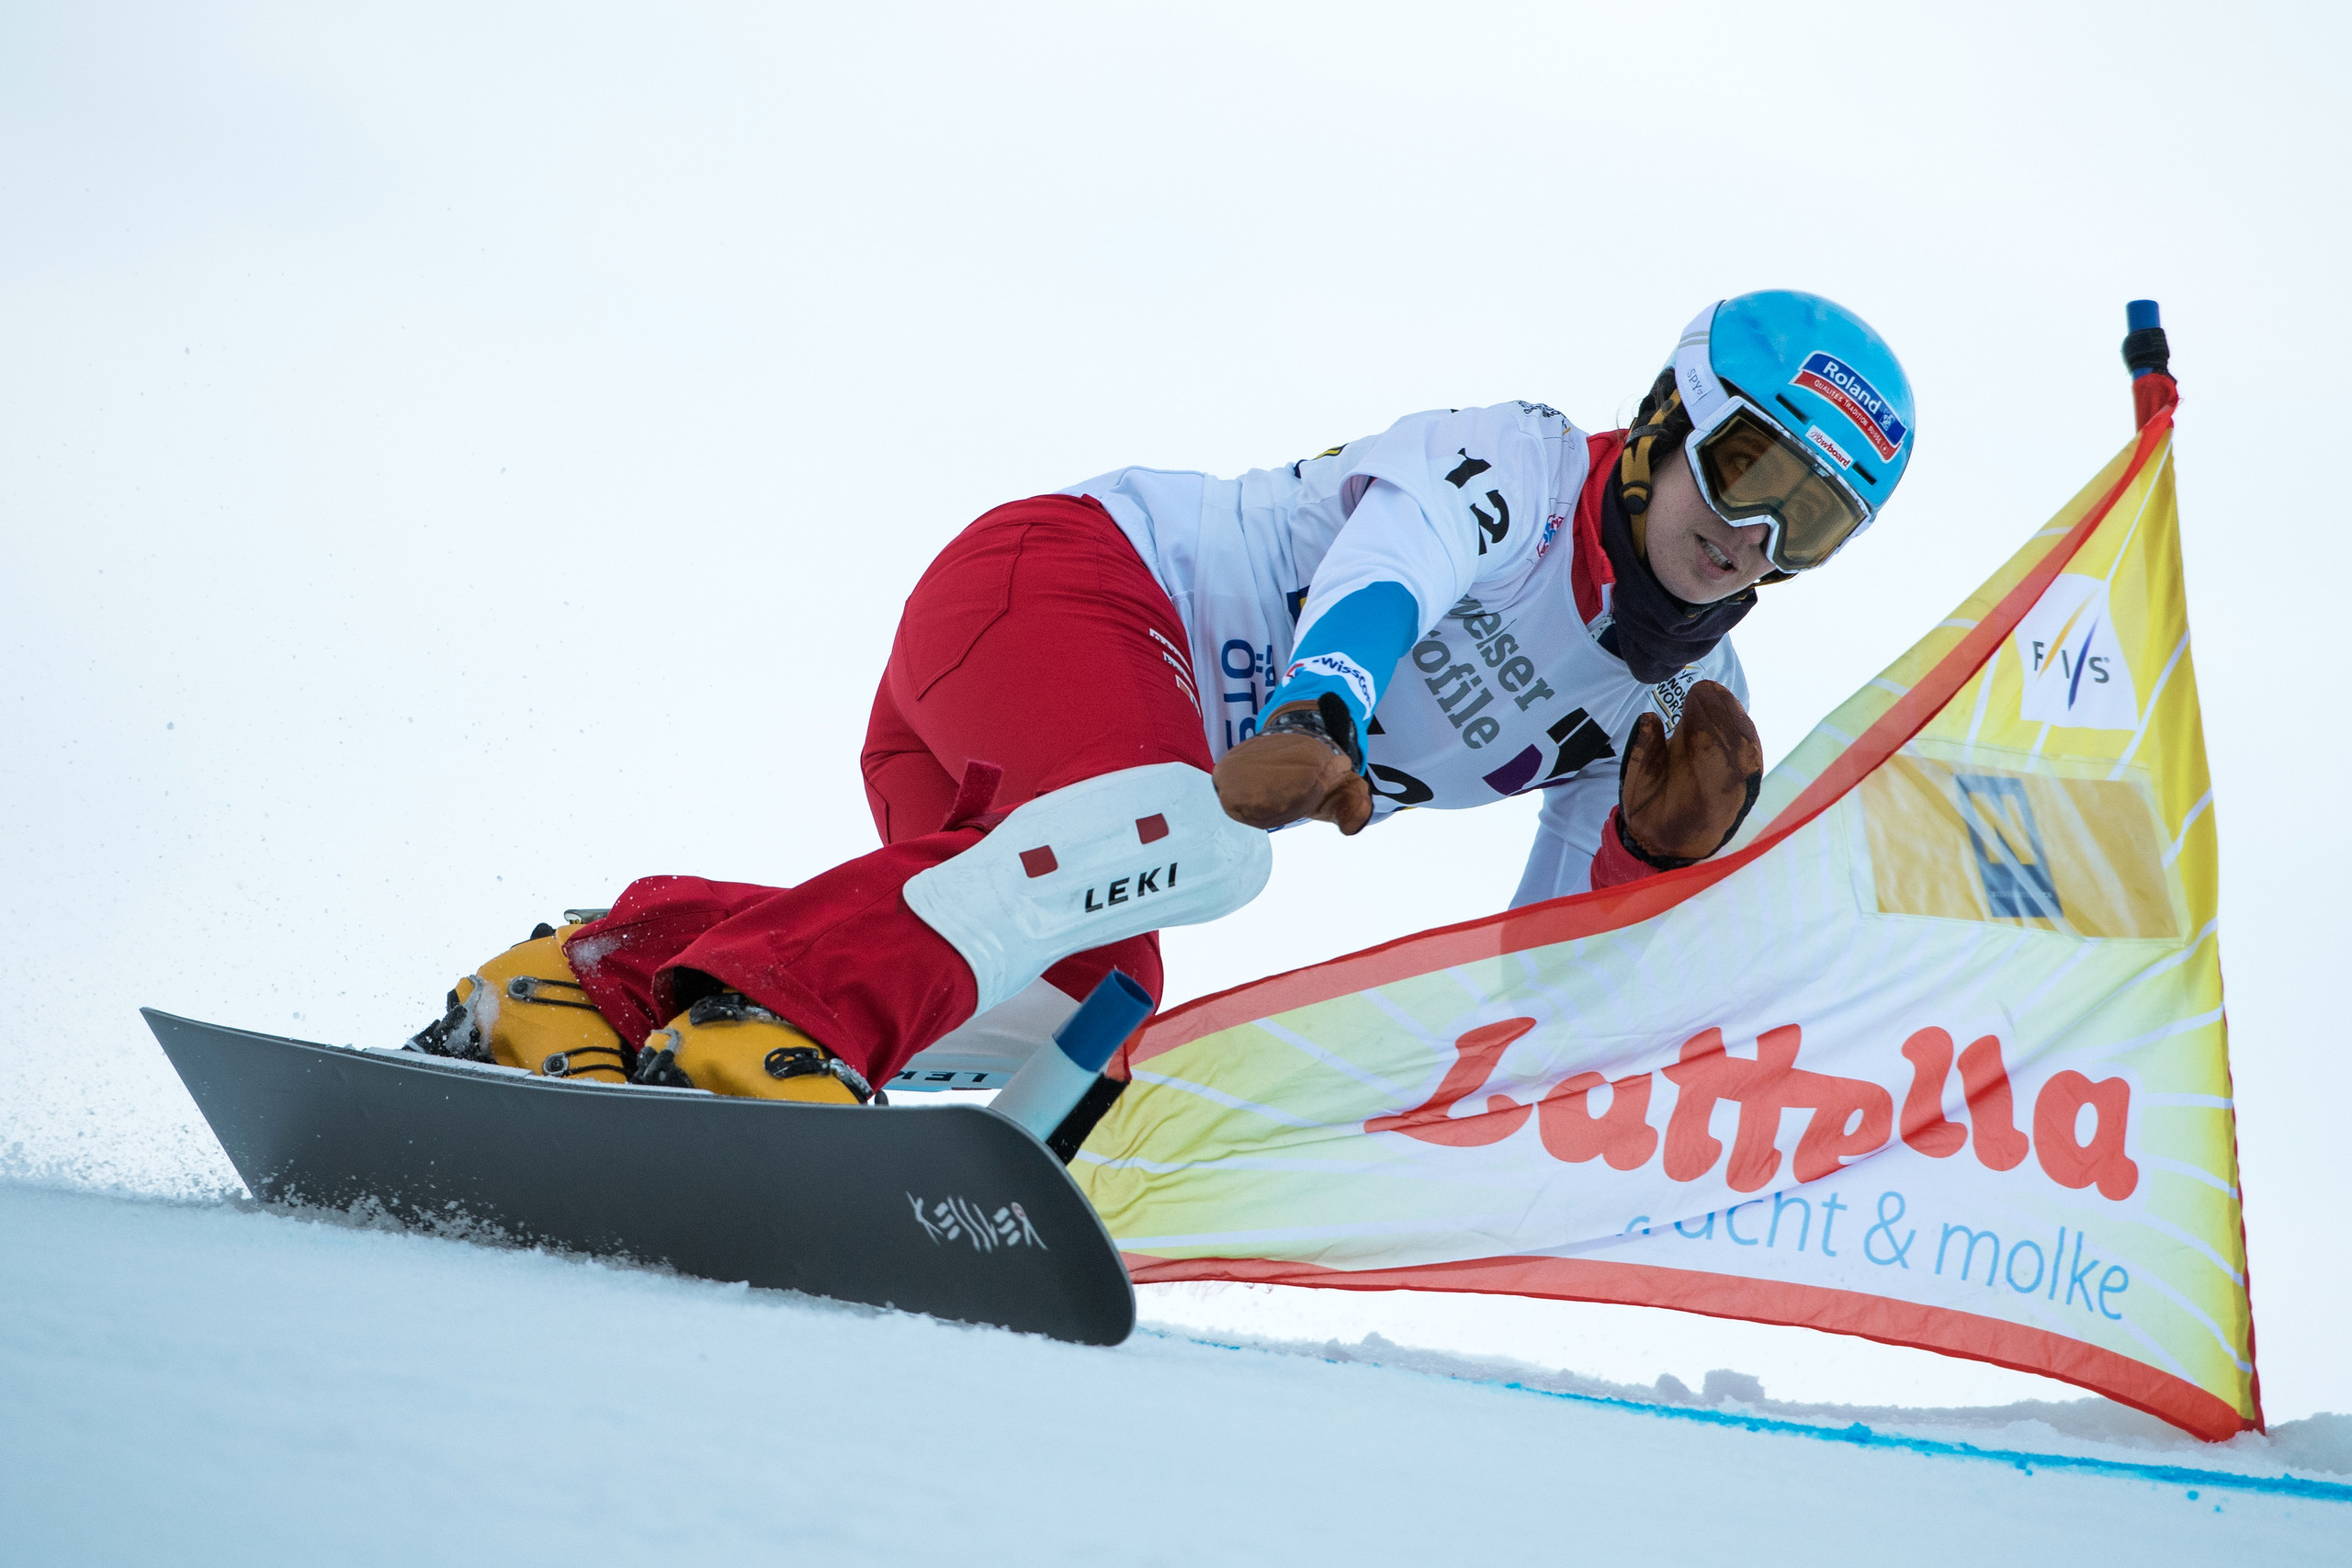 FIS Snowboard World Cup - Lackenhof AUT - PGS - KUMMER Patrizia SUI © Miha Matavz/FIS